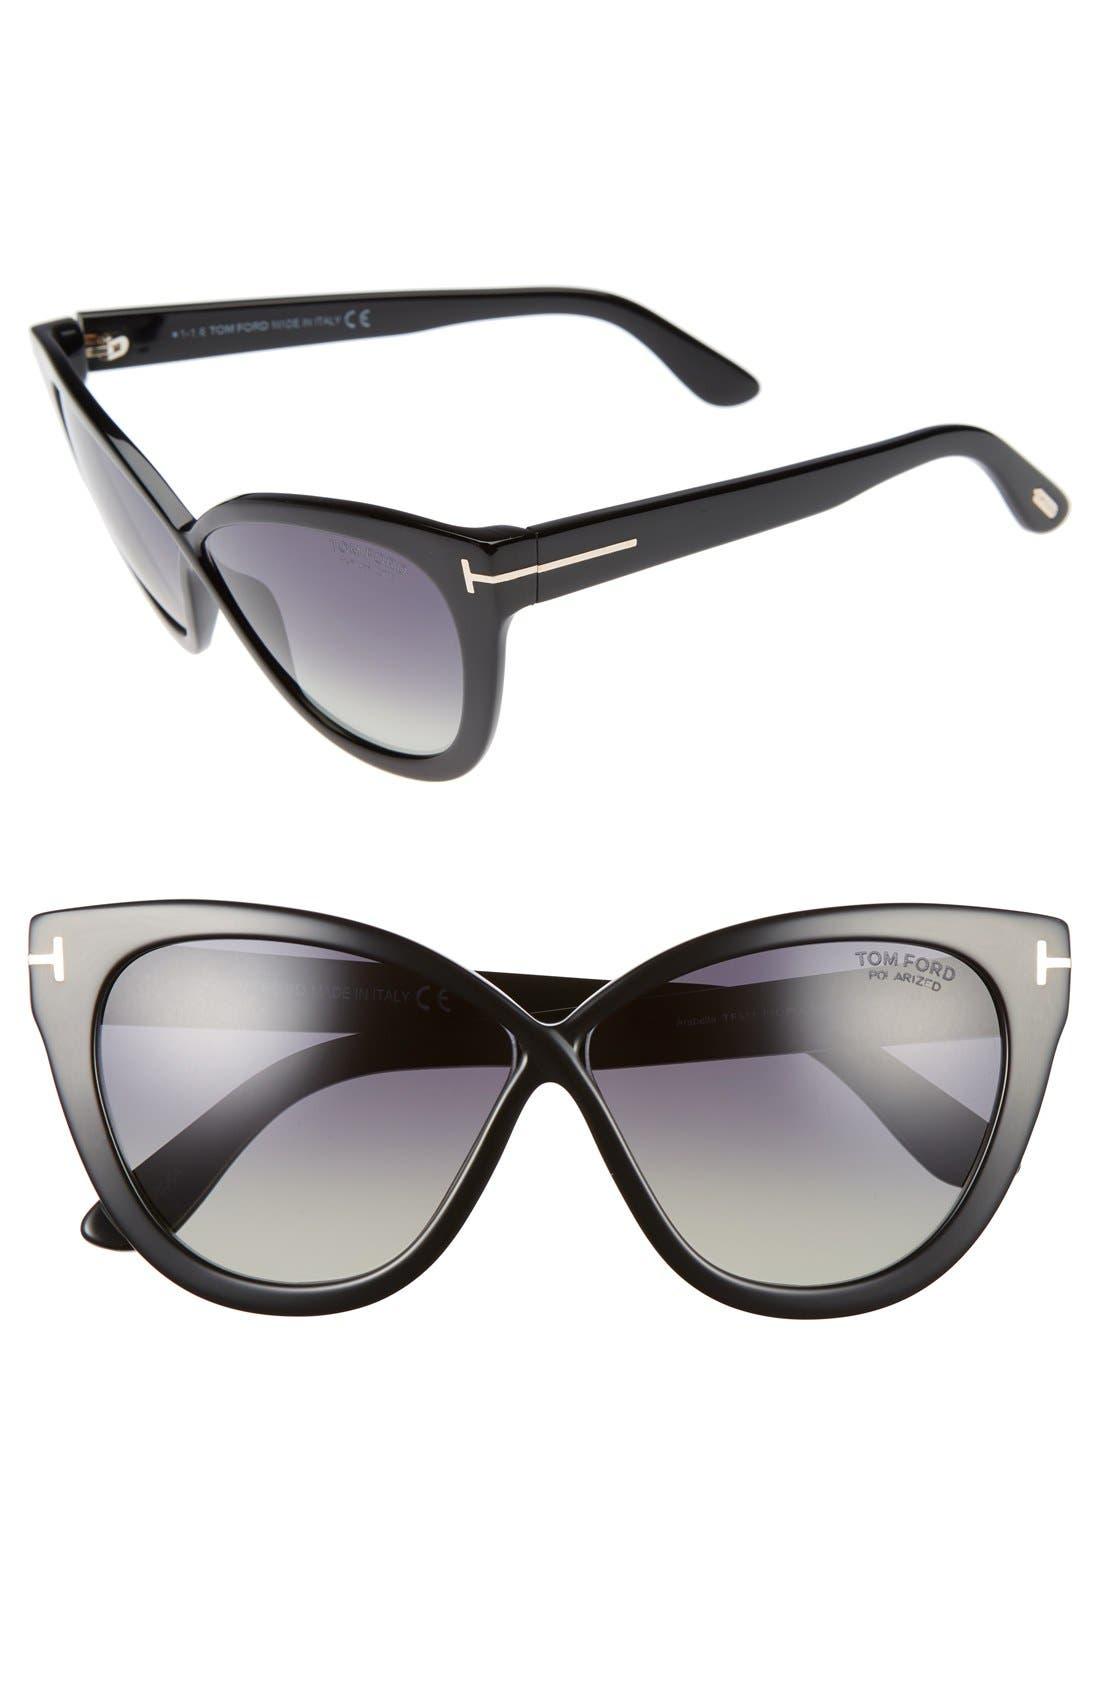 Arabella 59mm Cat Eye Sunglasses,                             Main thumbnail 1, color,                             Black/ Polar Gradient Smoke